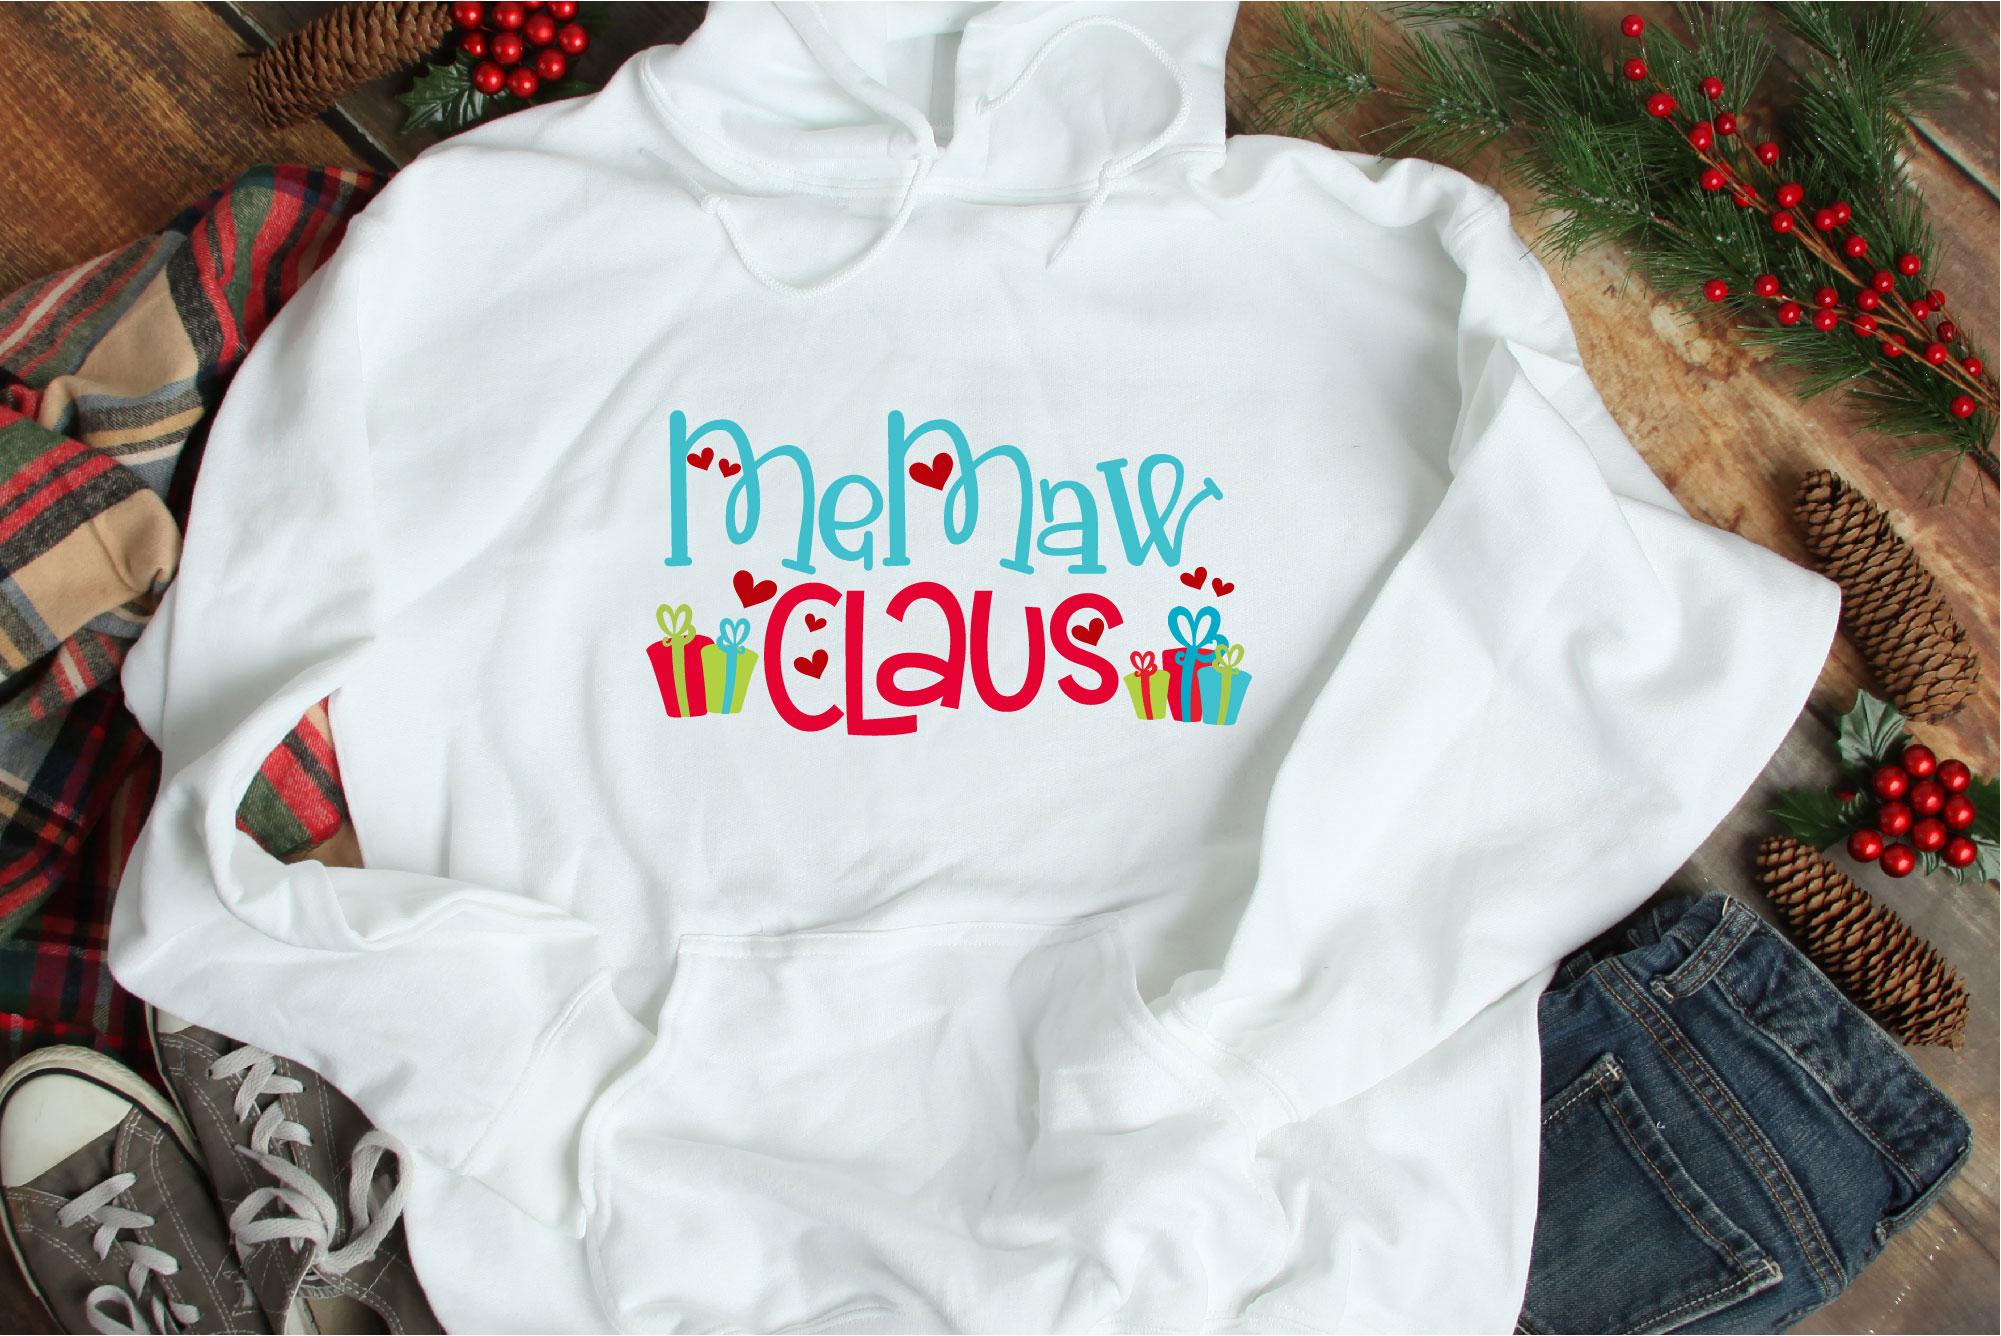 Christmas SVG, MeMaw Claus, Santa Claus Sublimation example image 1